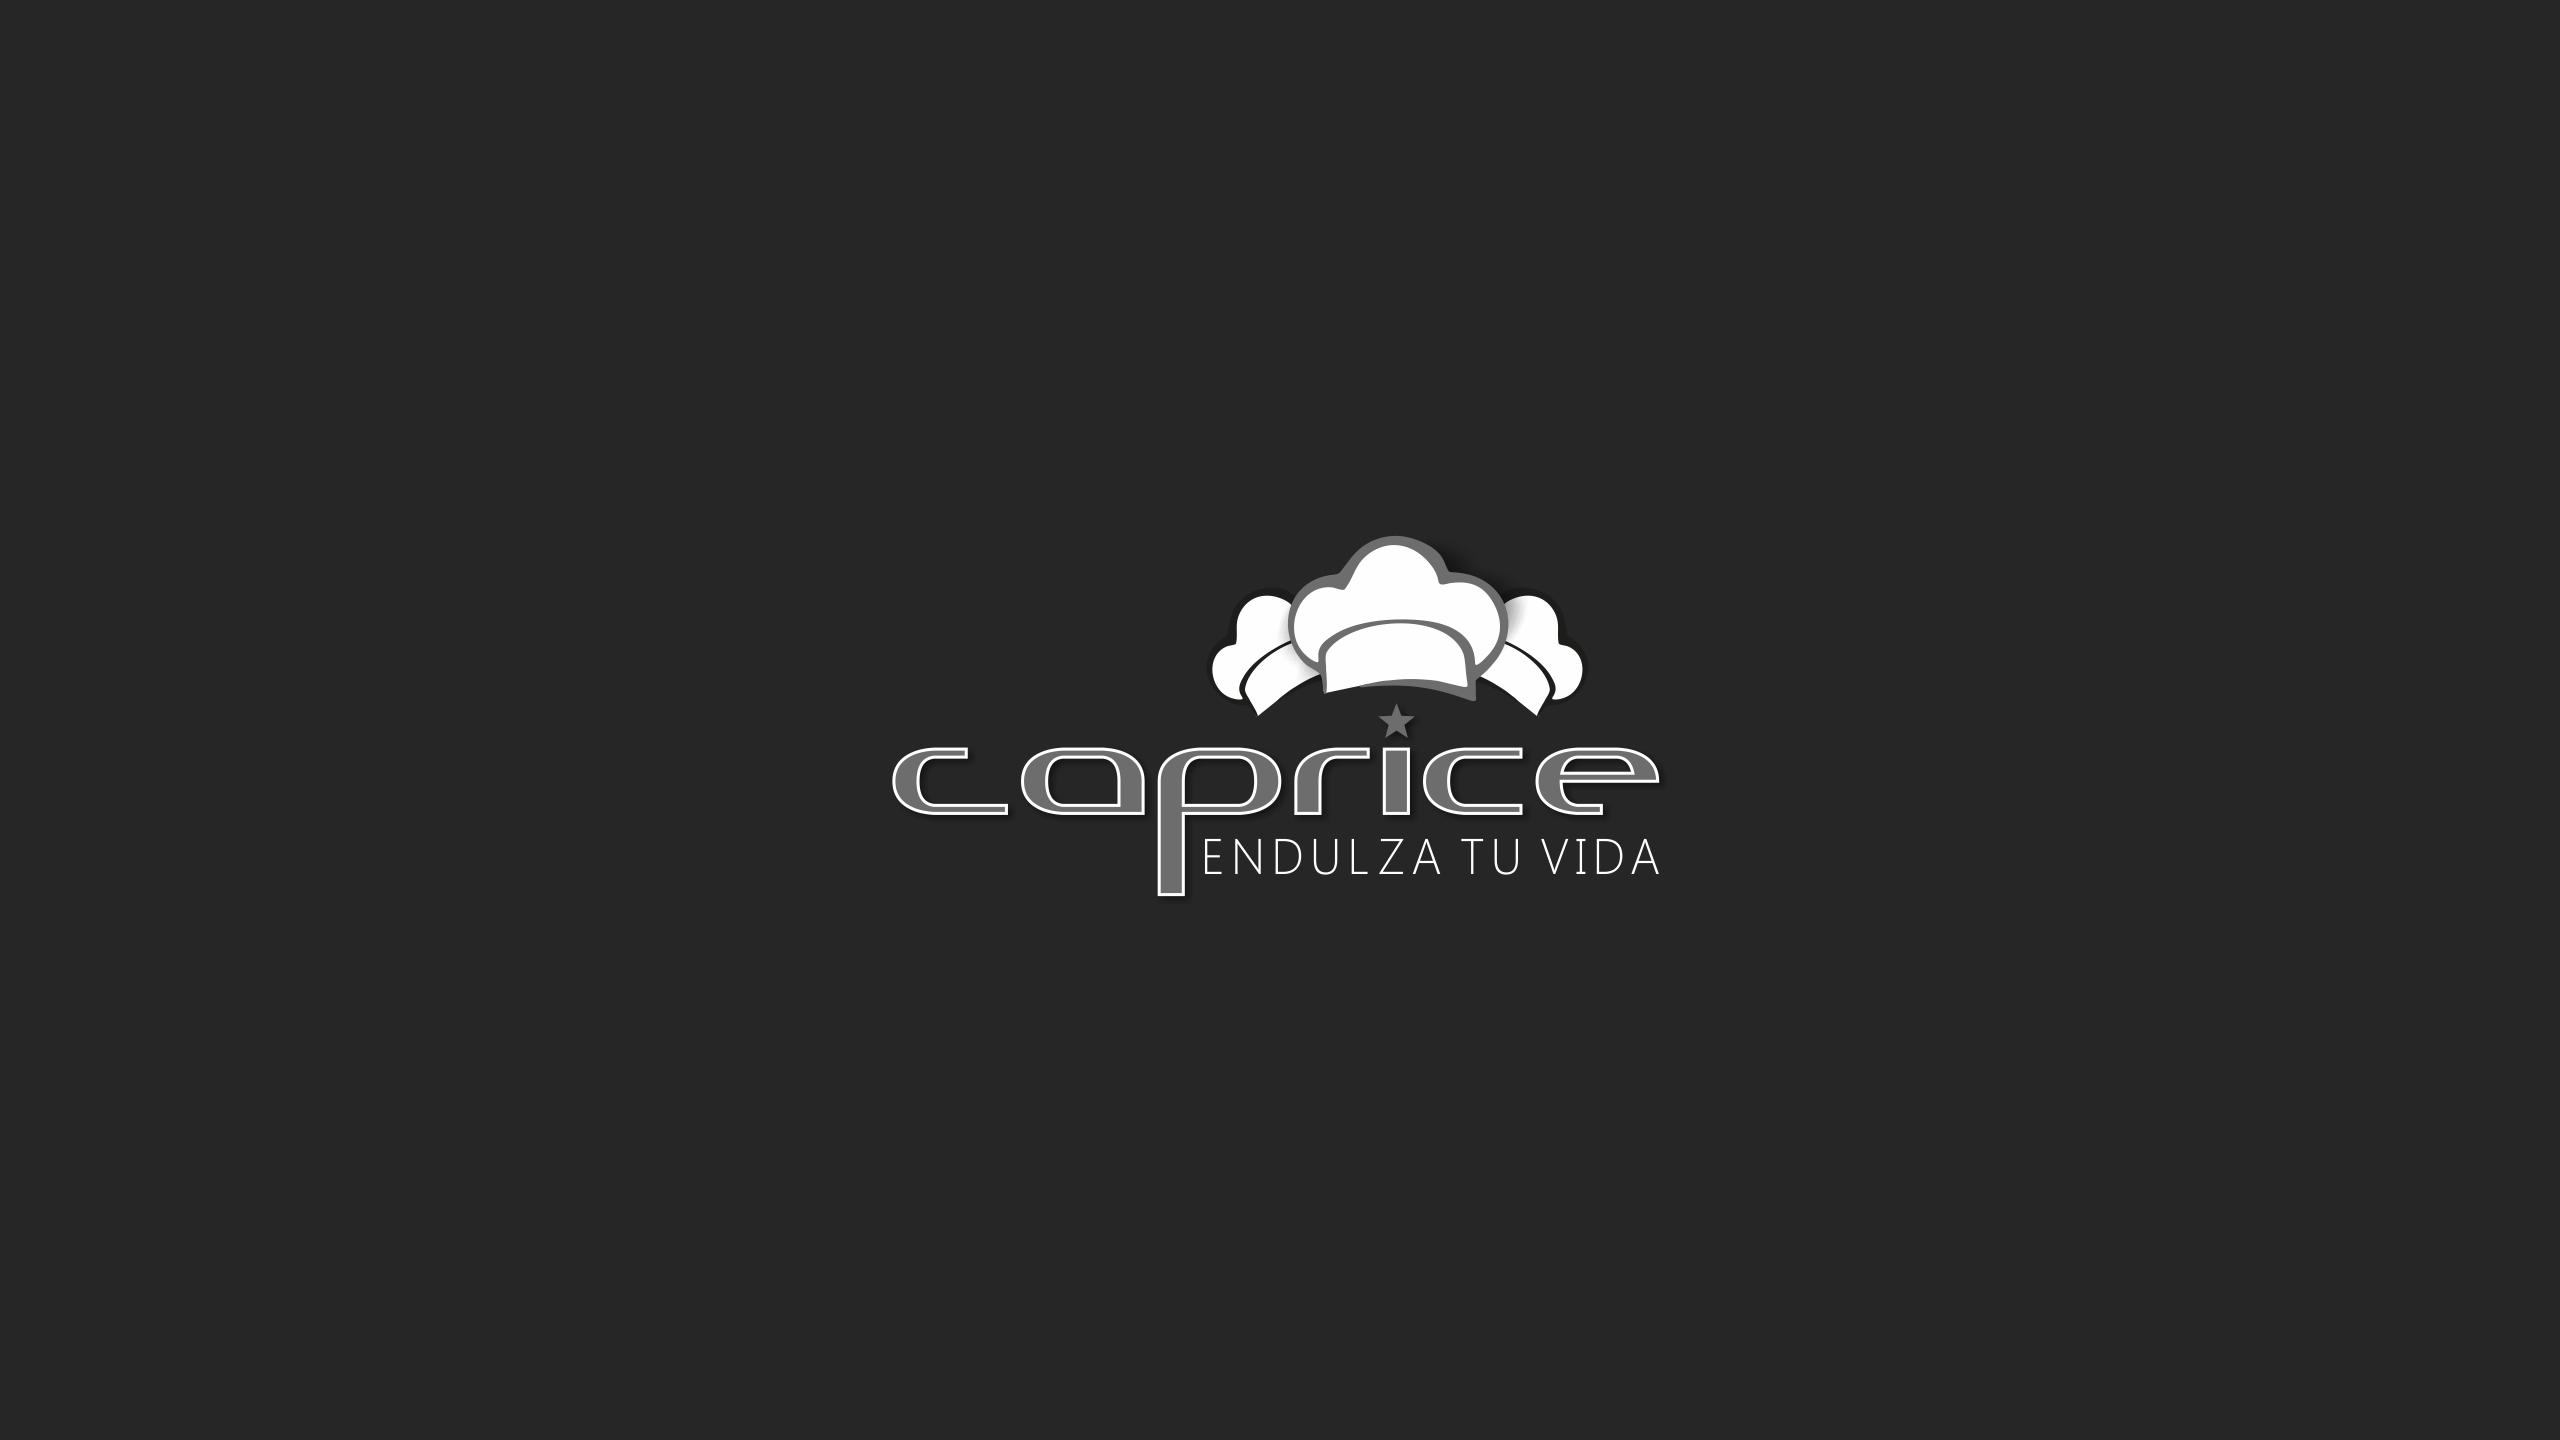 Diseño caprice logotipo